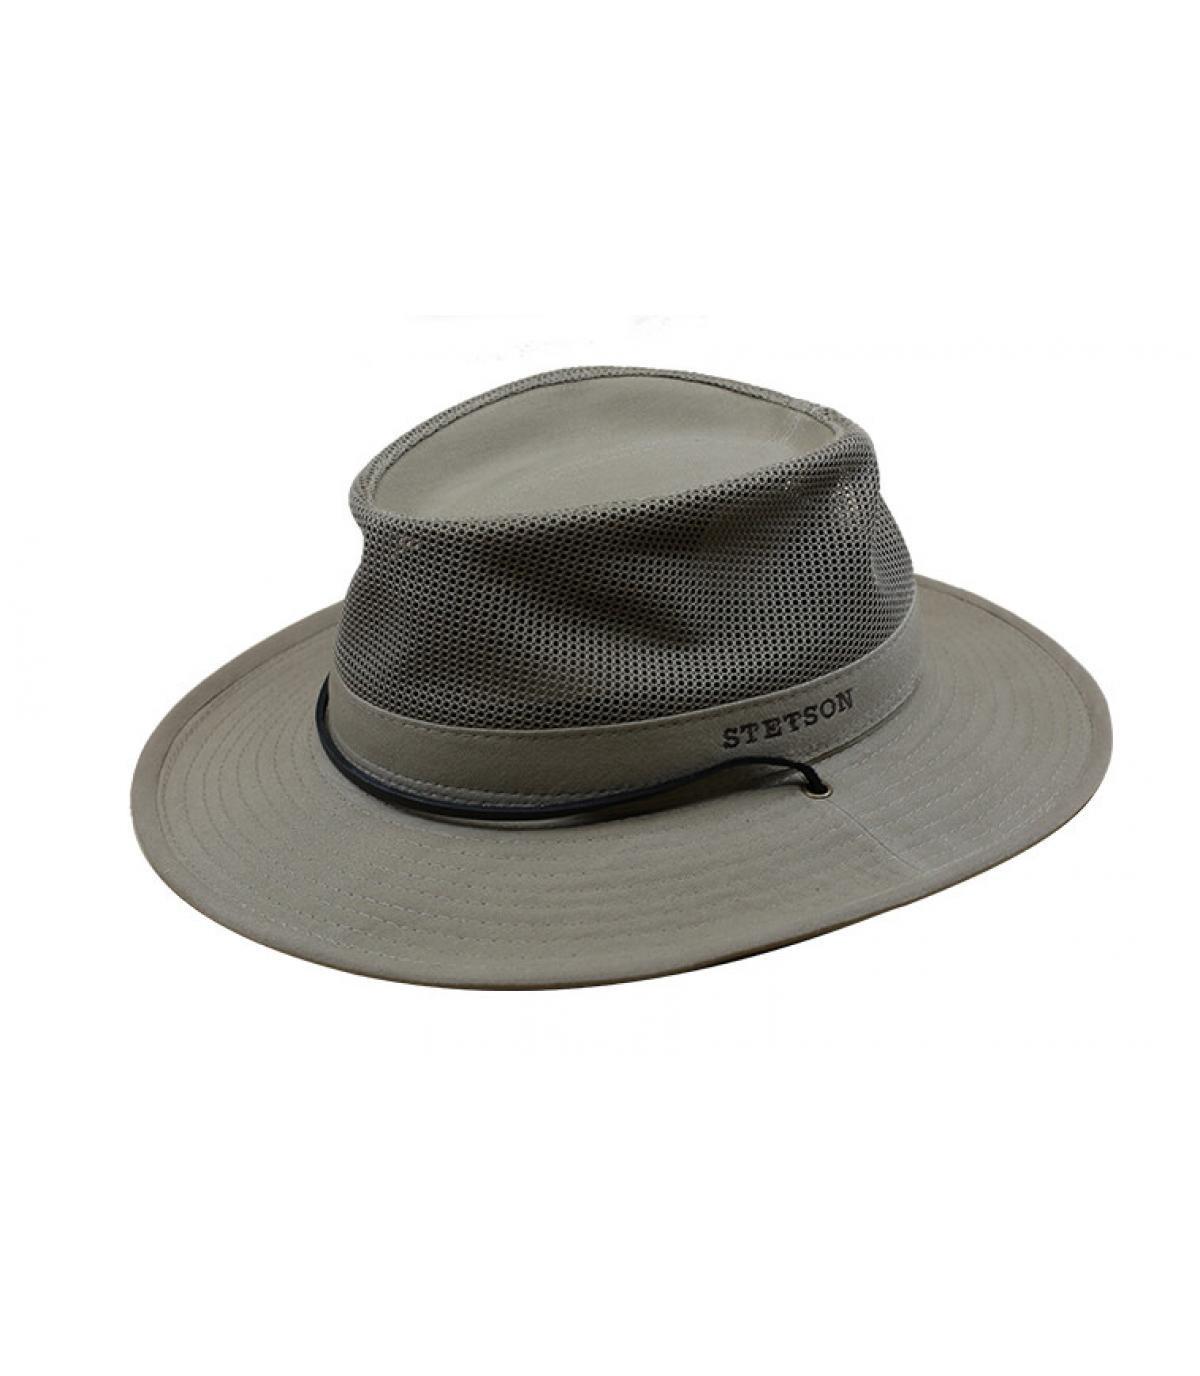 sombrero ventilado Stetson